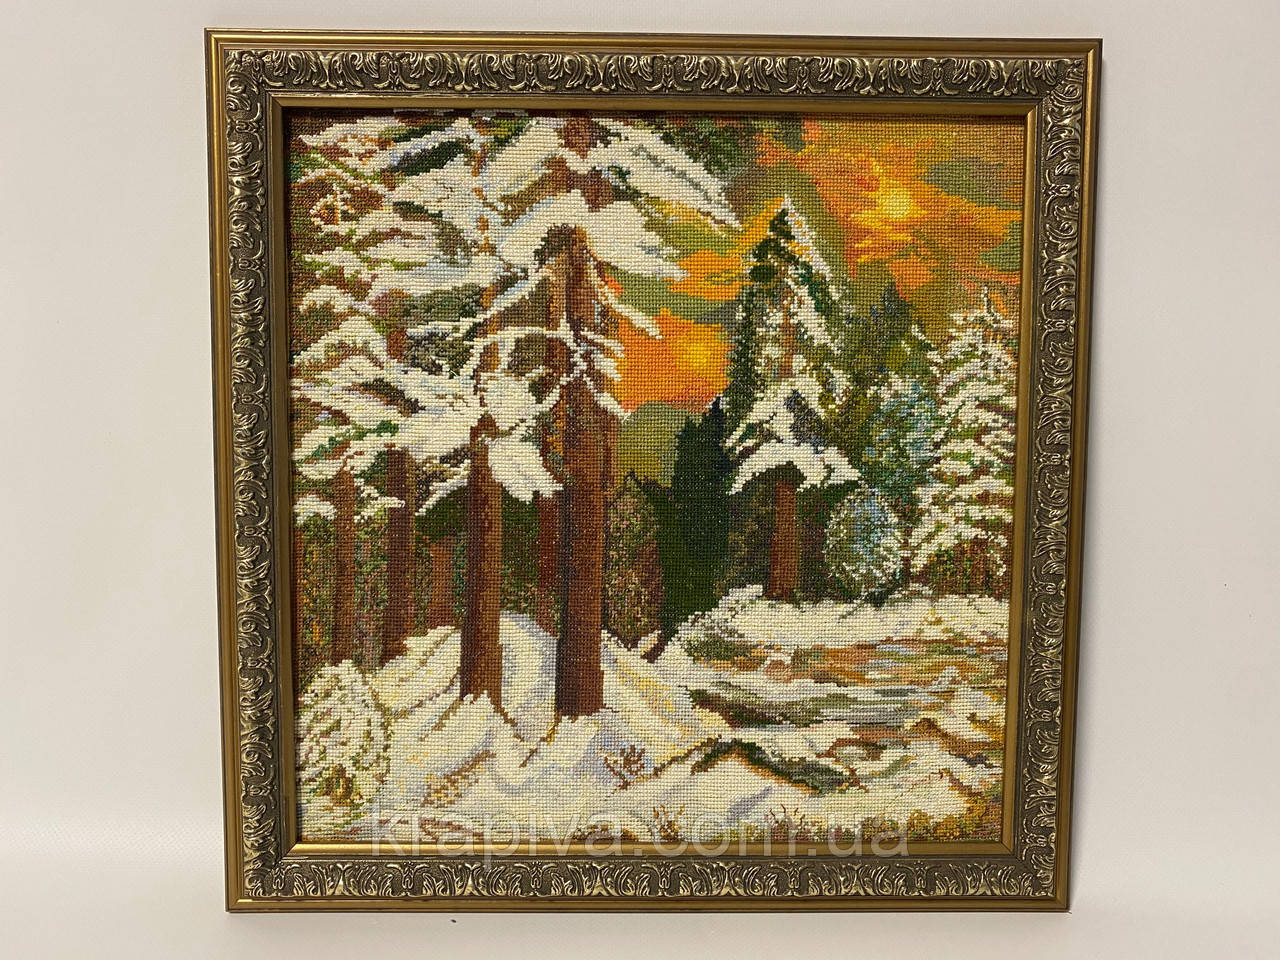 Картина вышивка Зимний лес 38*38 см, ручная работа, картина вишивка ручної роботи